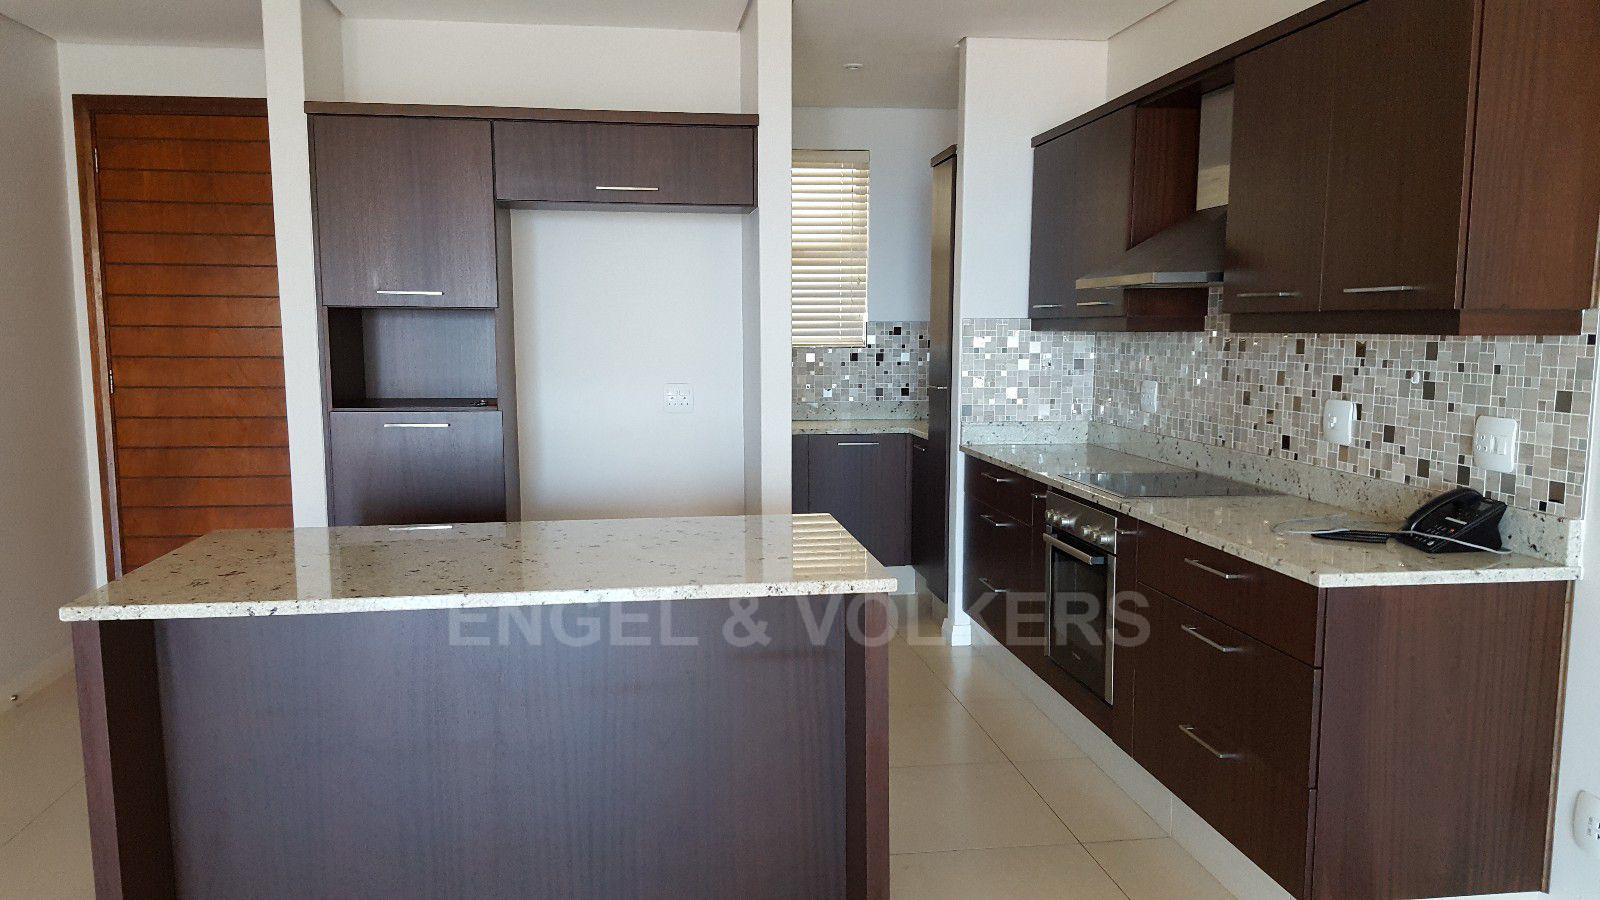 Umhlanga Rocks property for sale. Ref No: 13400359. Picture no 6